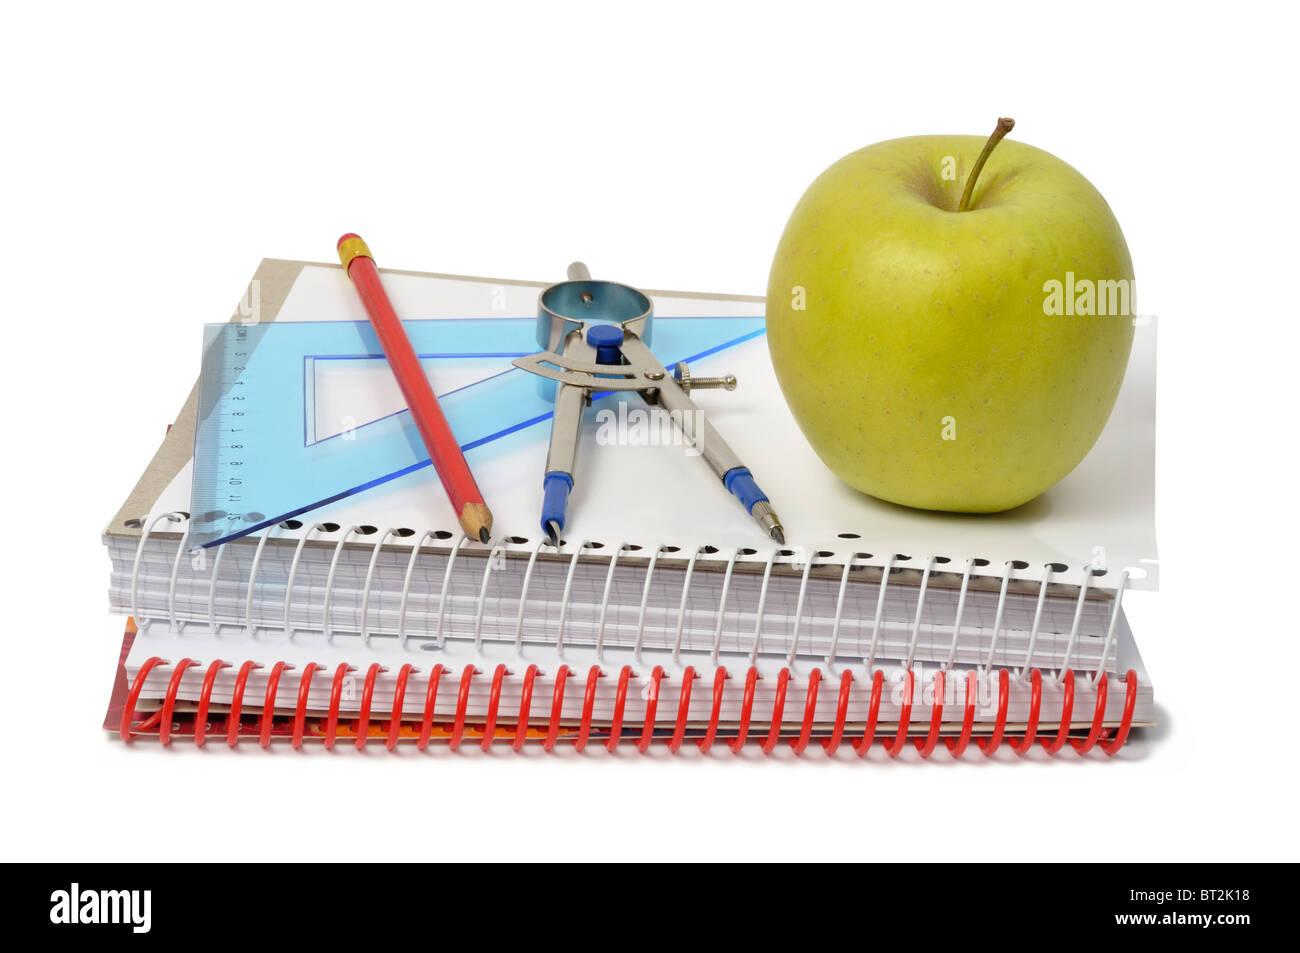 School Accessories - Stock Image